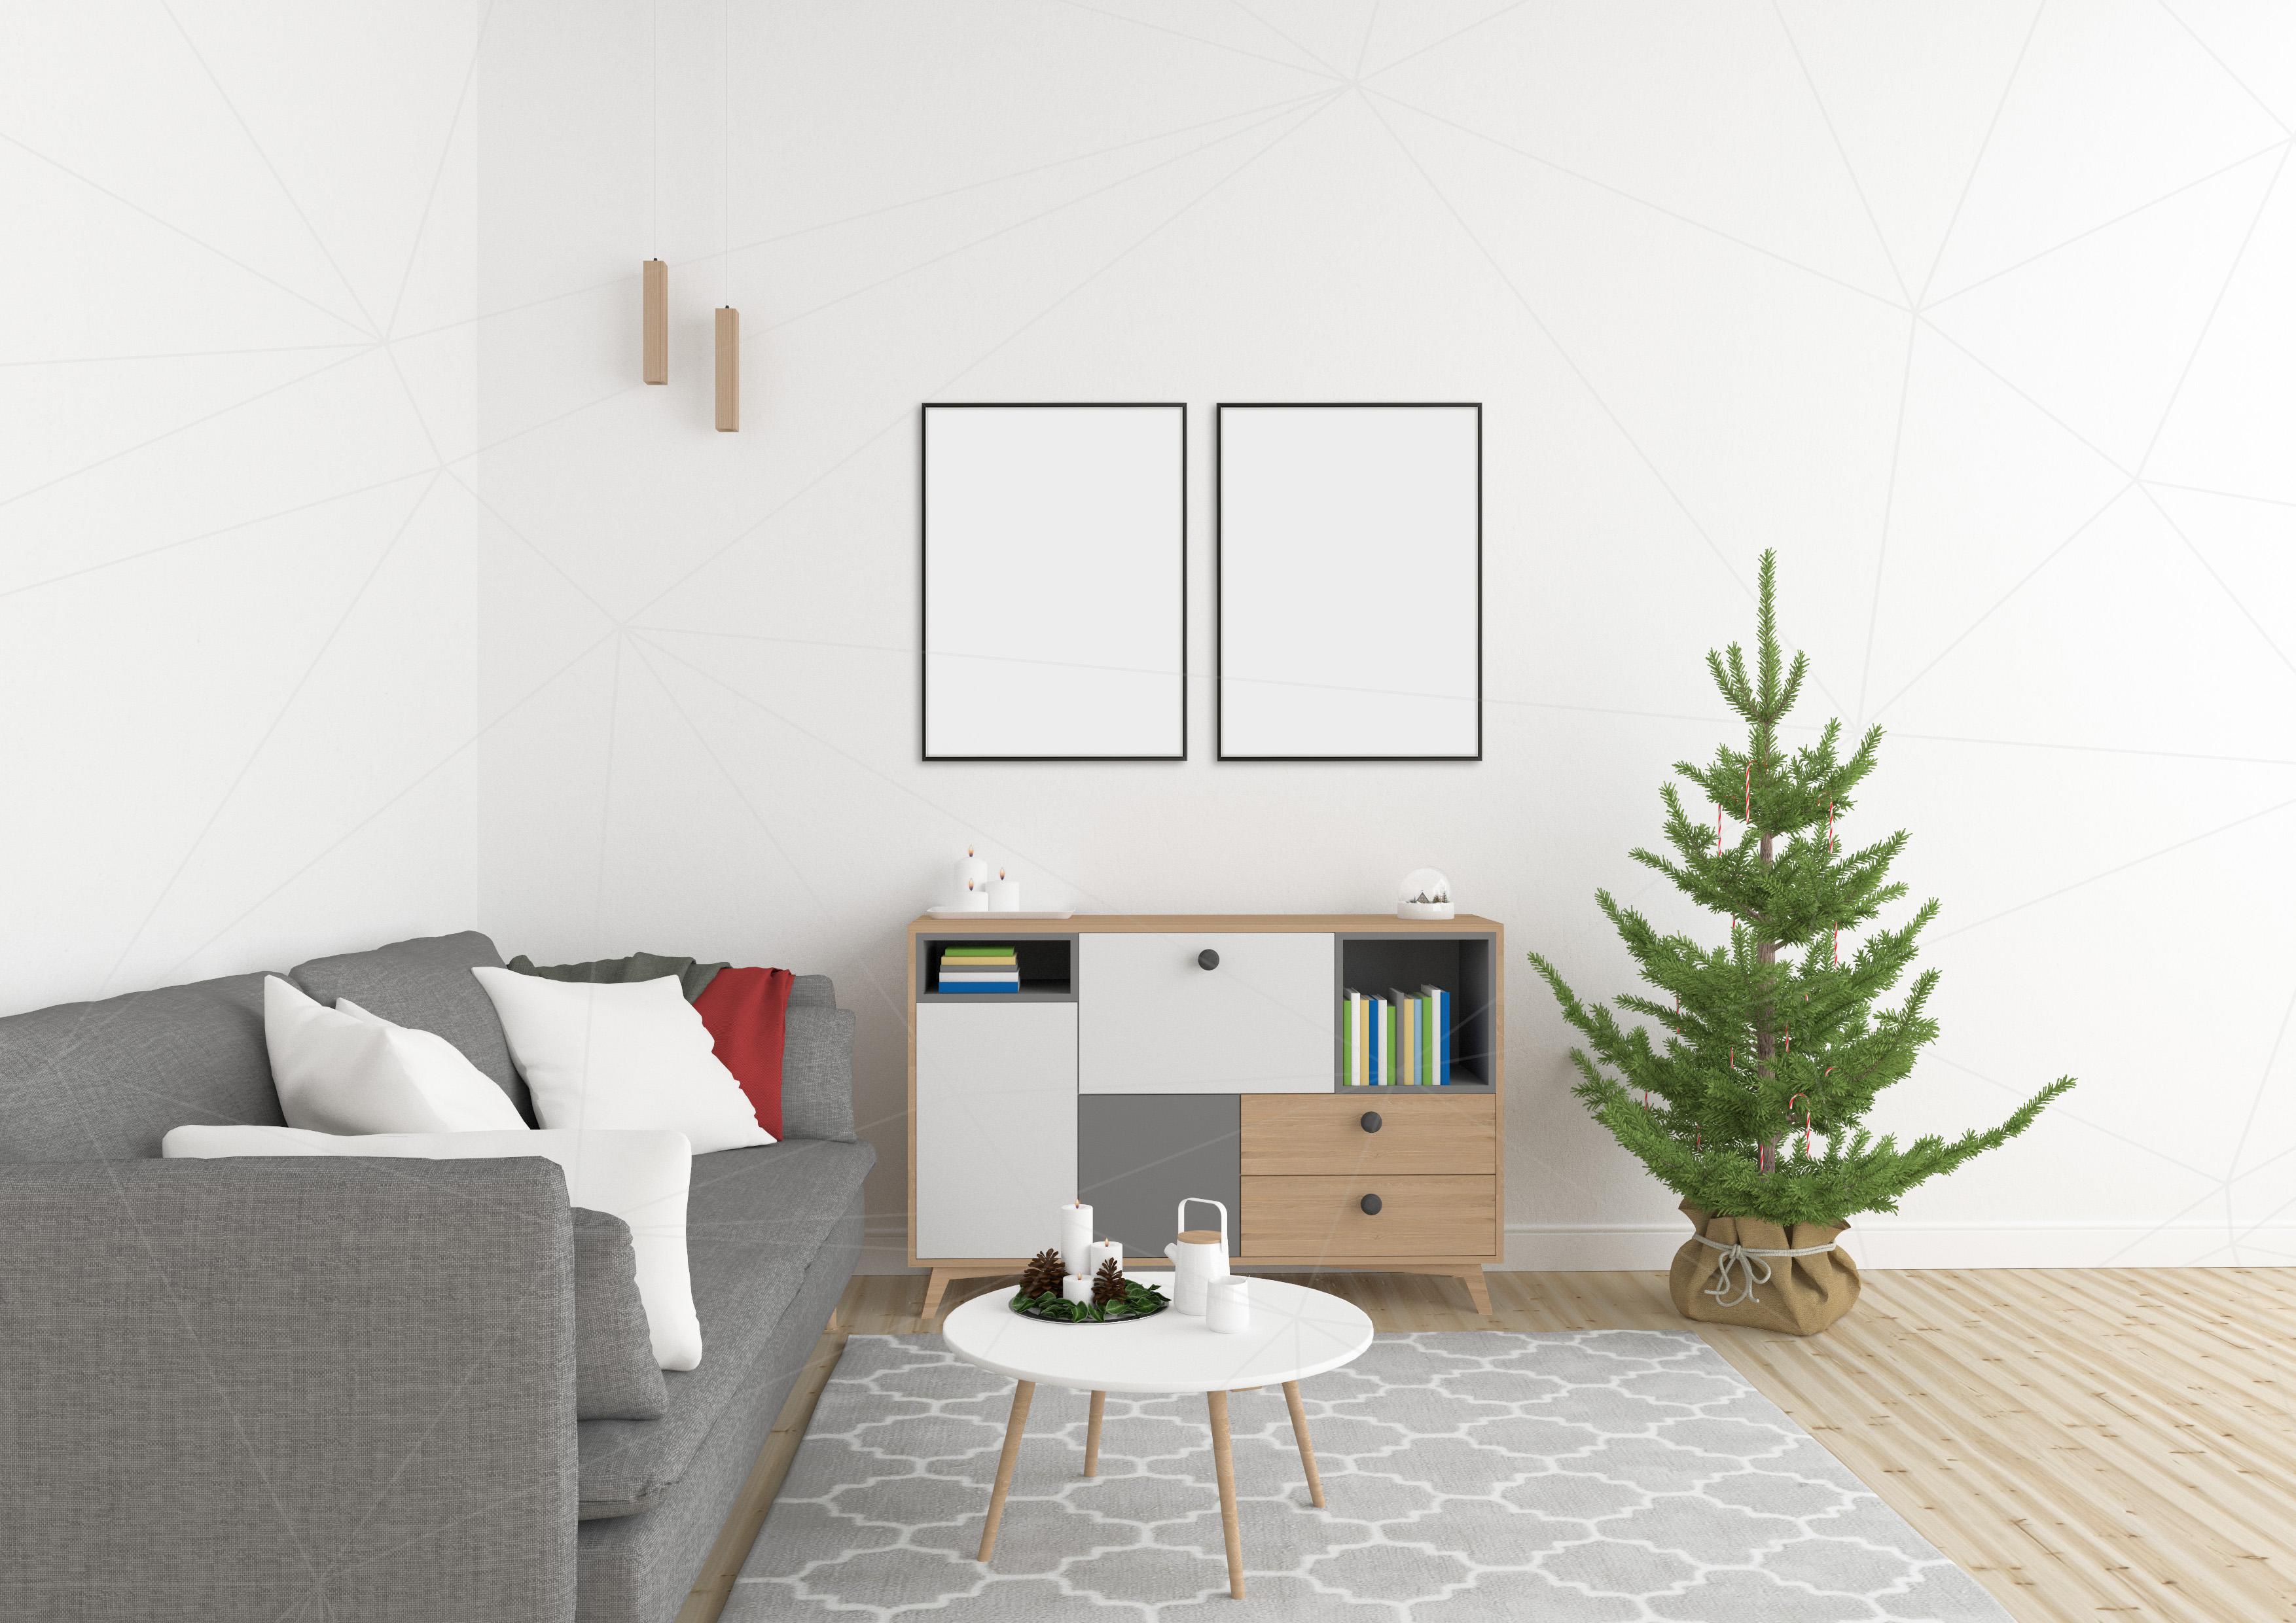 Christmas interior mockup bundle - blank wall mock up example image 4